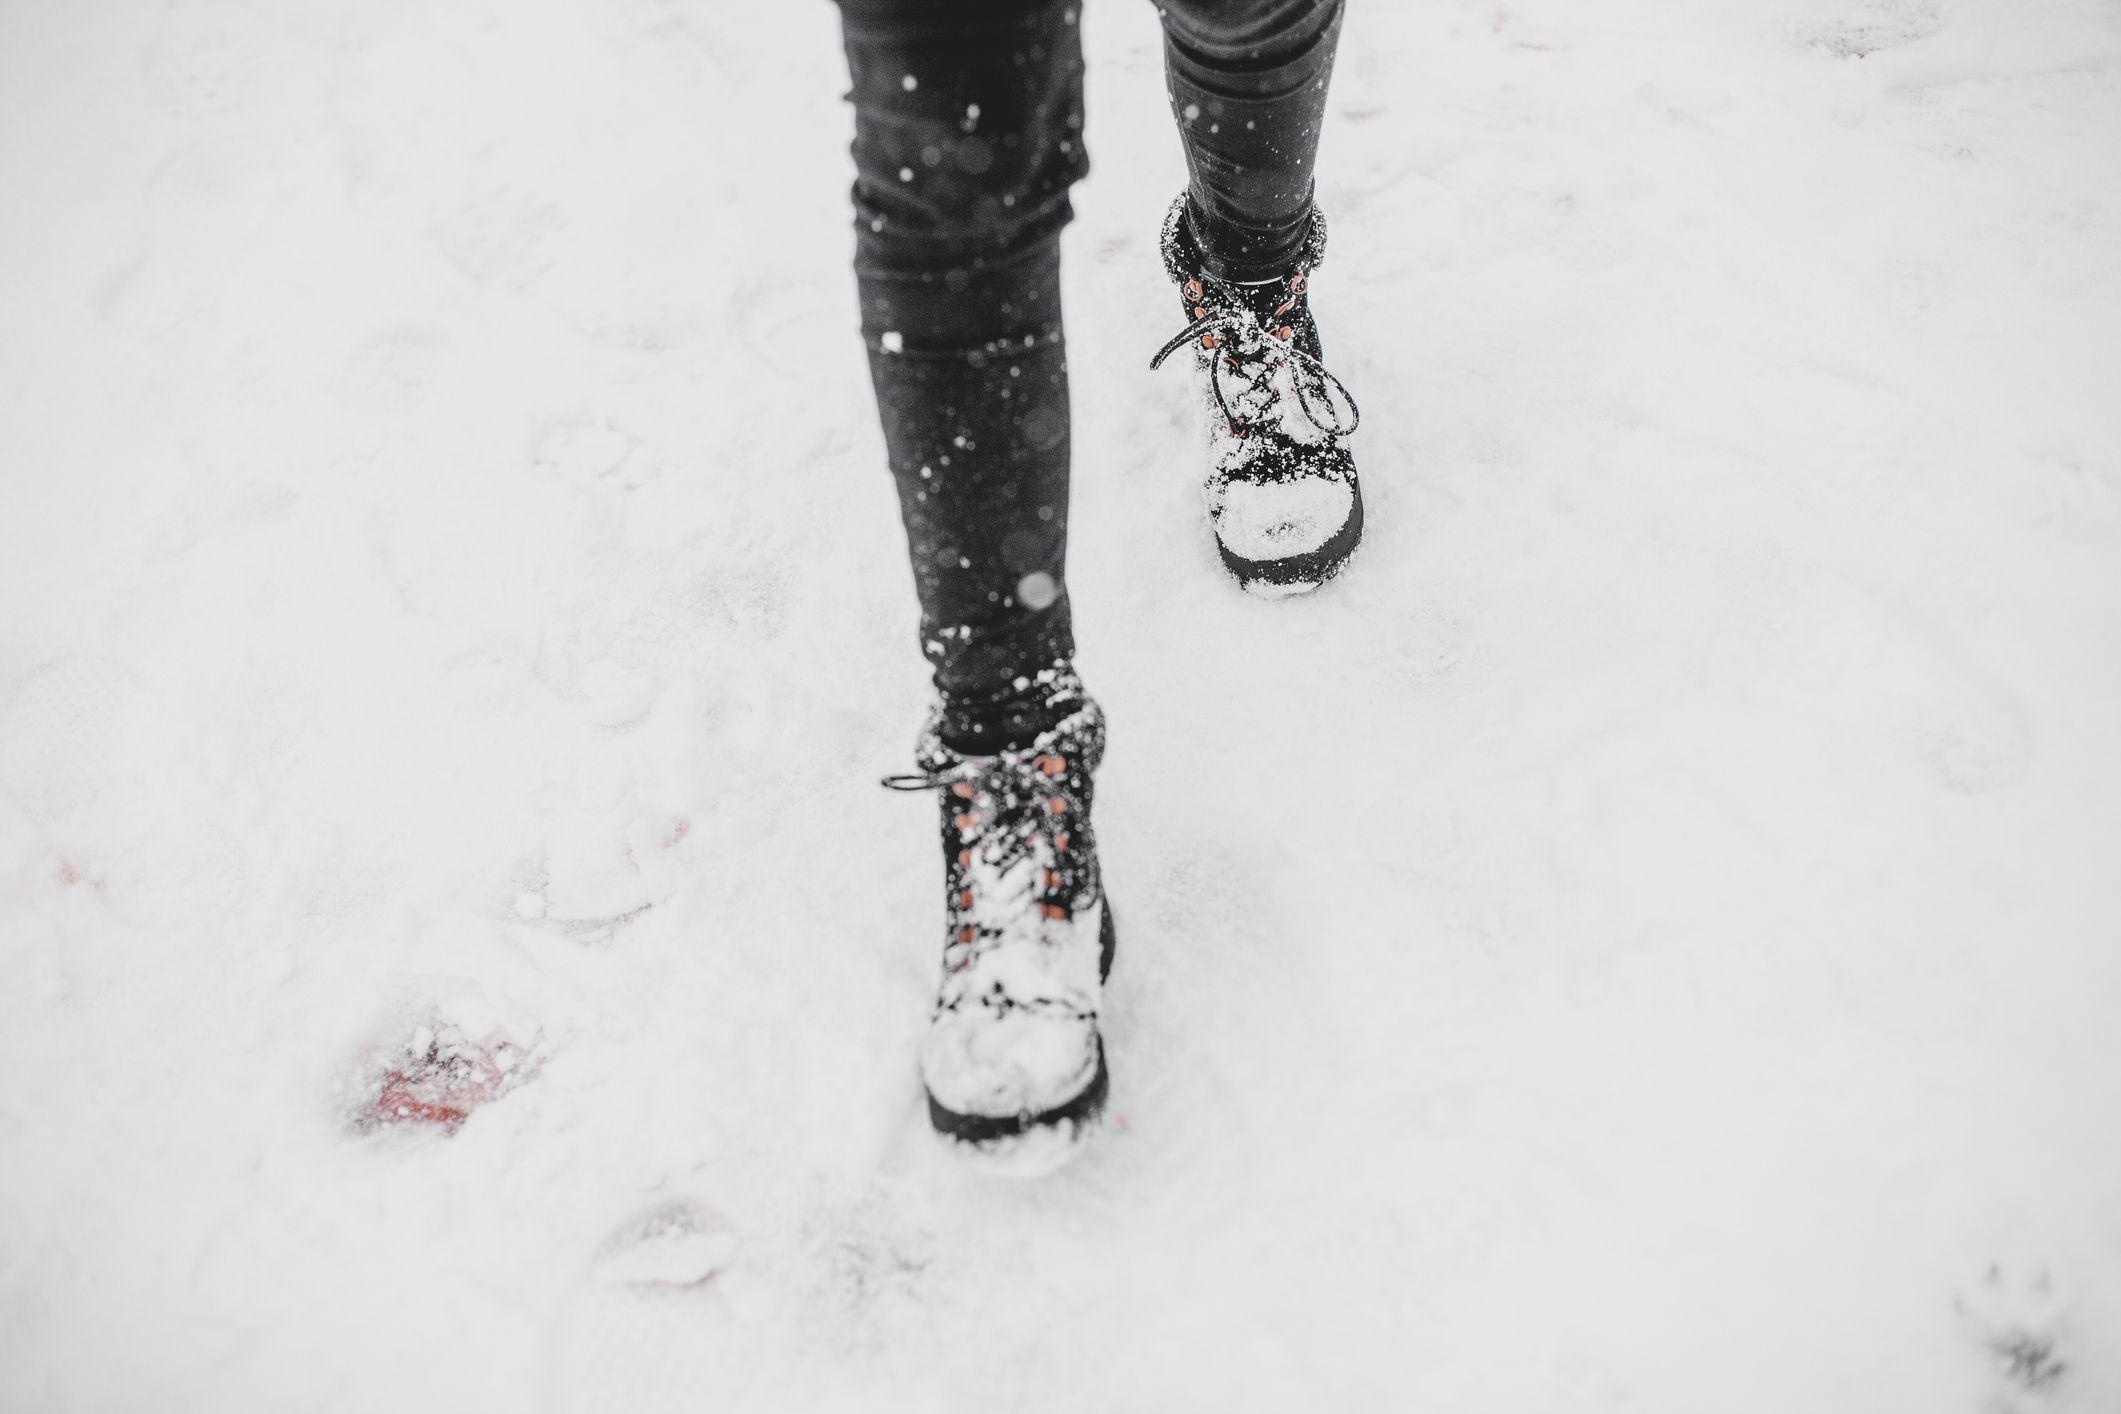 128bd4ddff6b1 The Best Women's Winter Boots of 2019